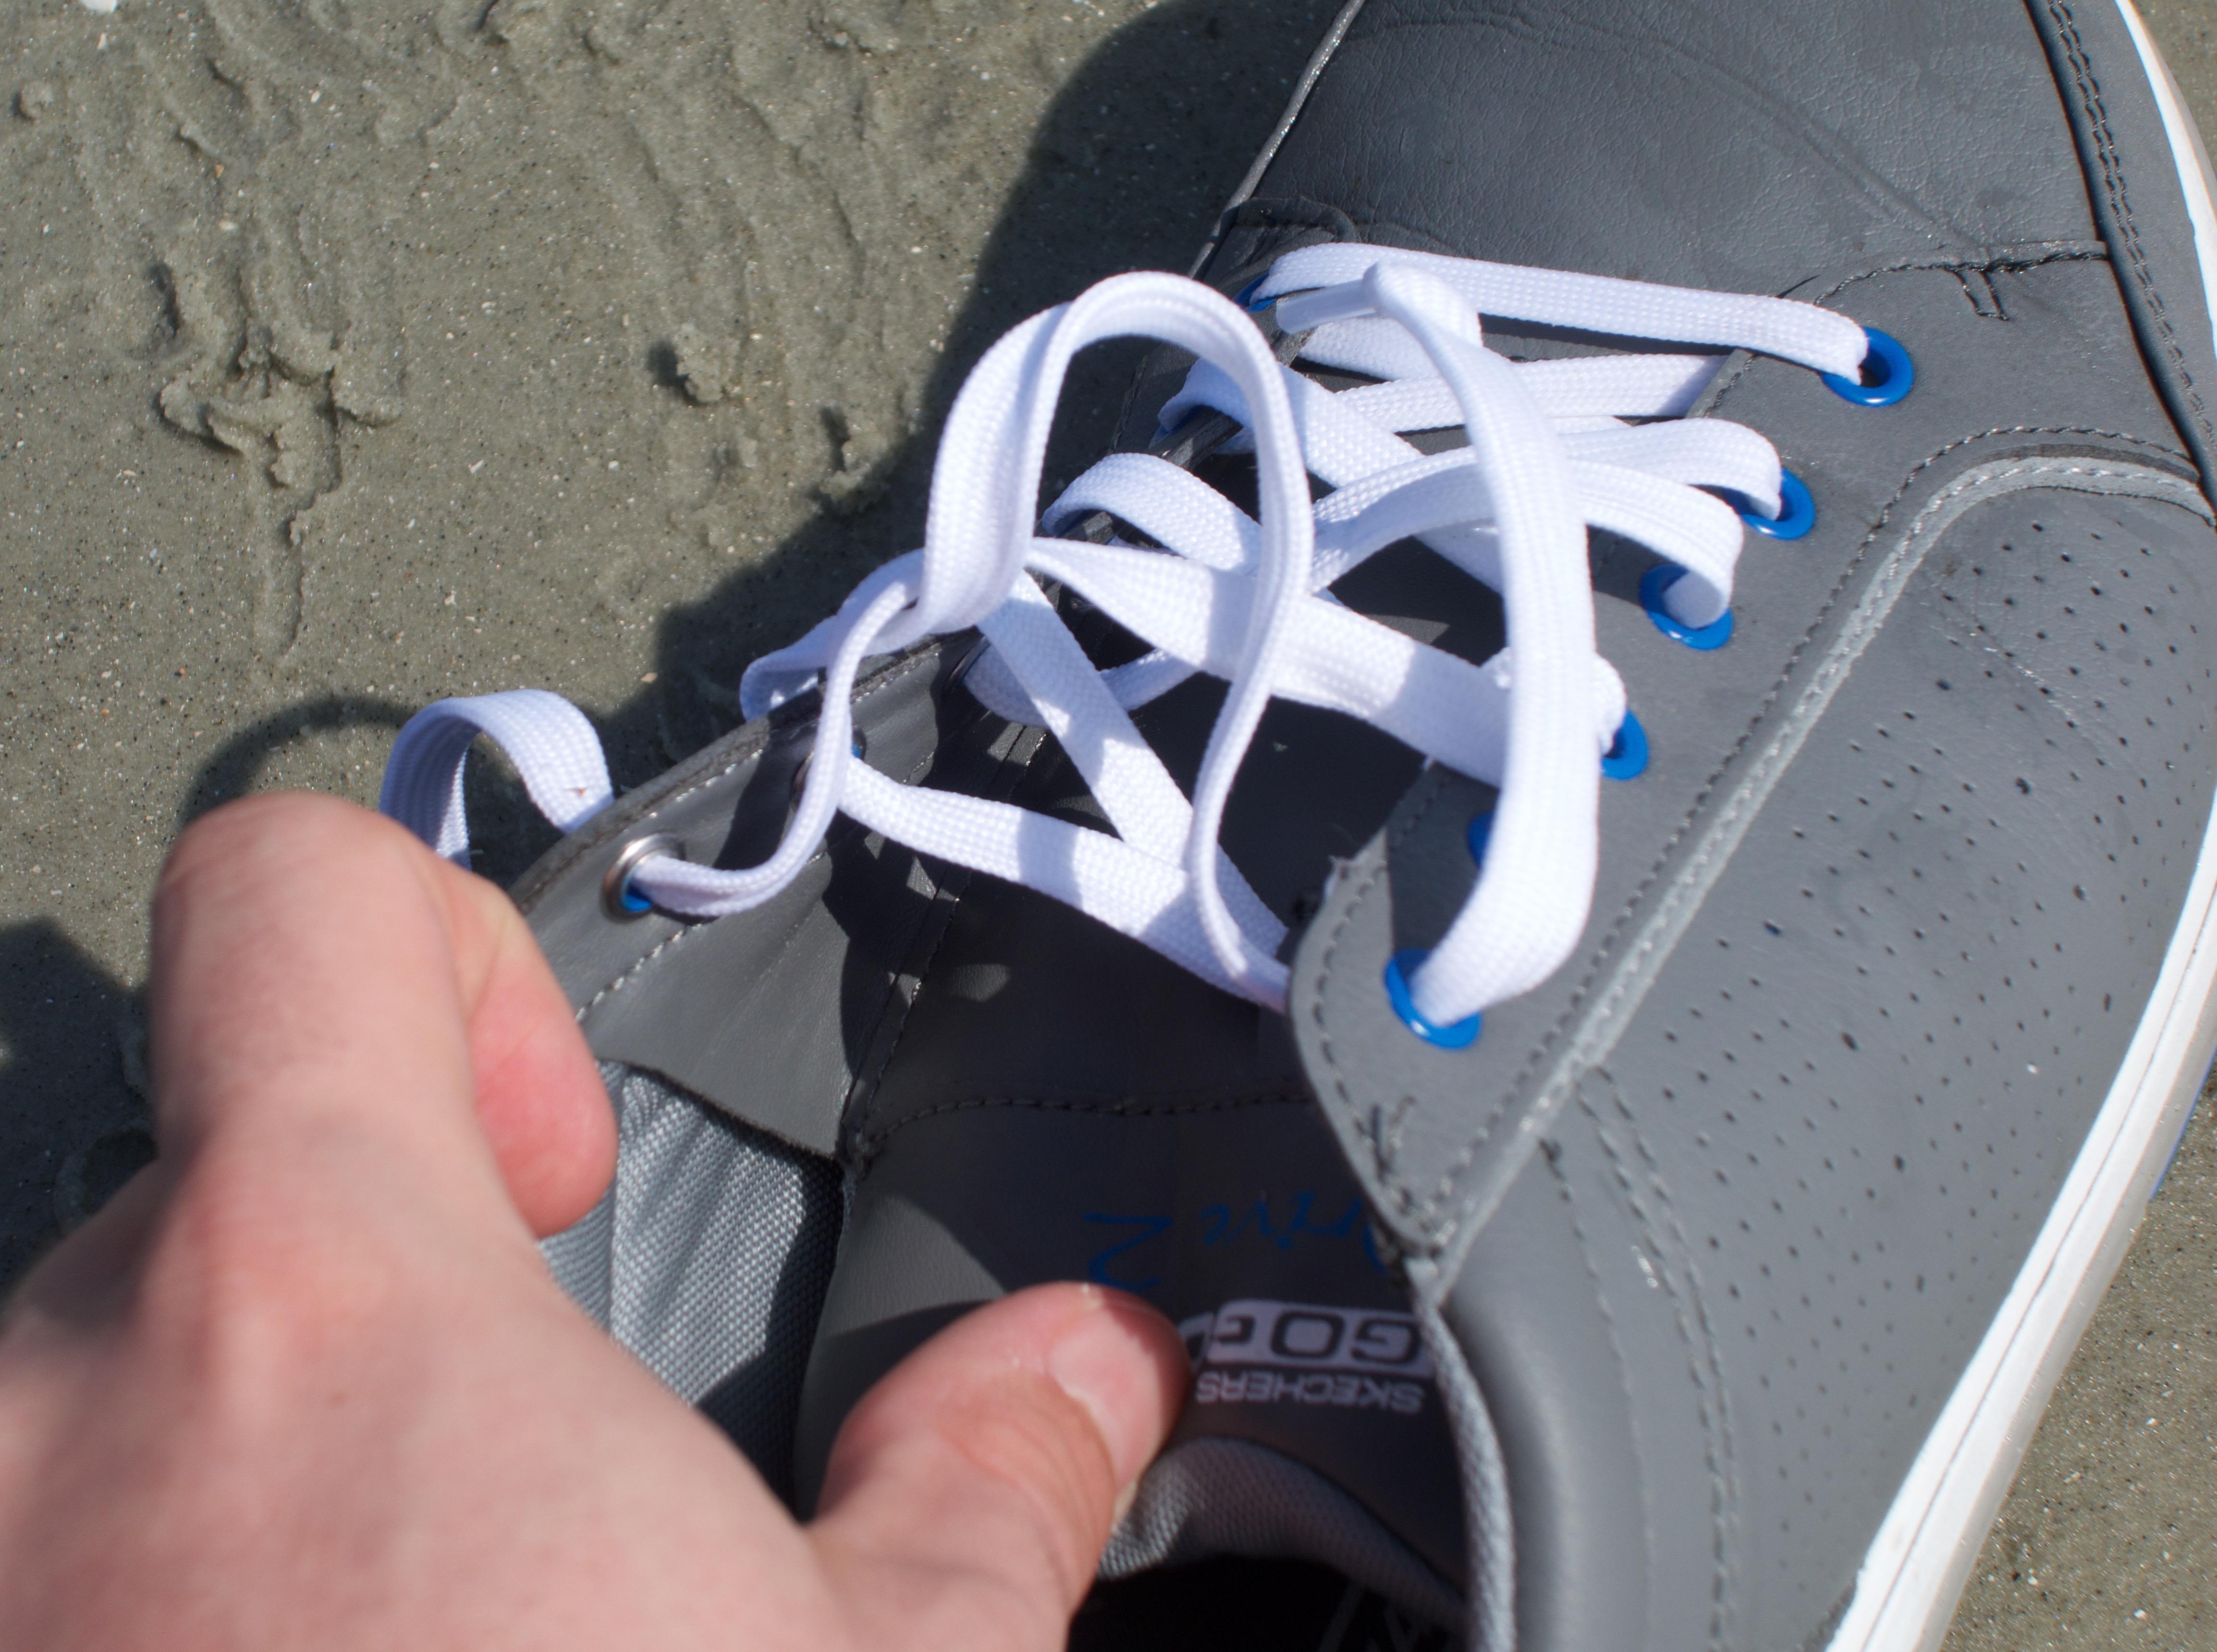 5d73bb587a3c Skechers Go Golf - Drive 2 Shoe Review - Graylyn Loomis